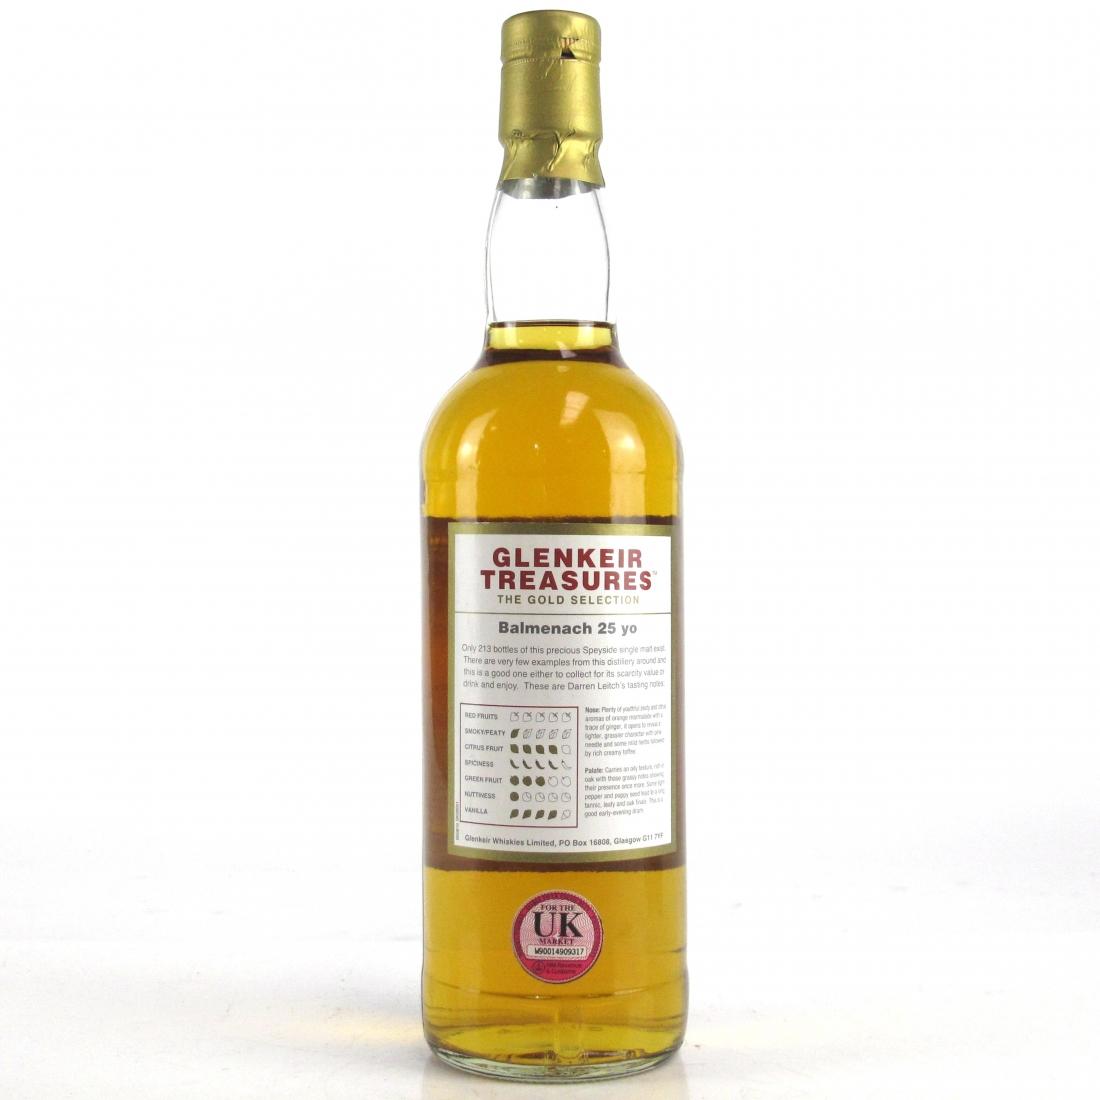 Balmenach 25 Year Old Glenkeir Treasures / Whisky Shop Exclusive